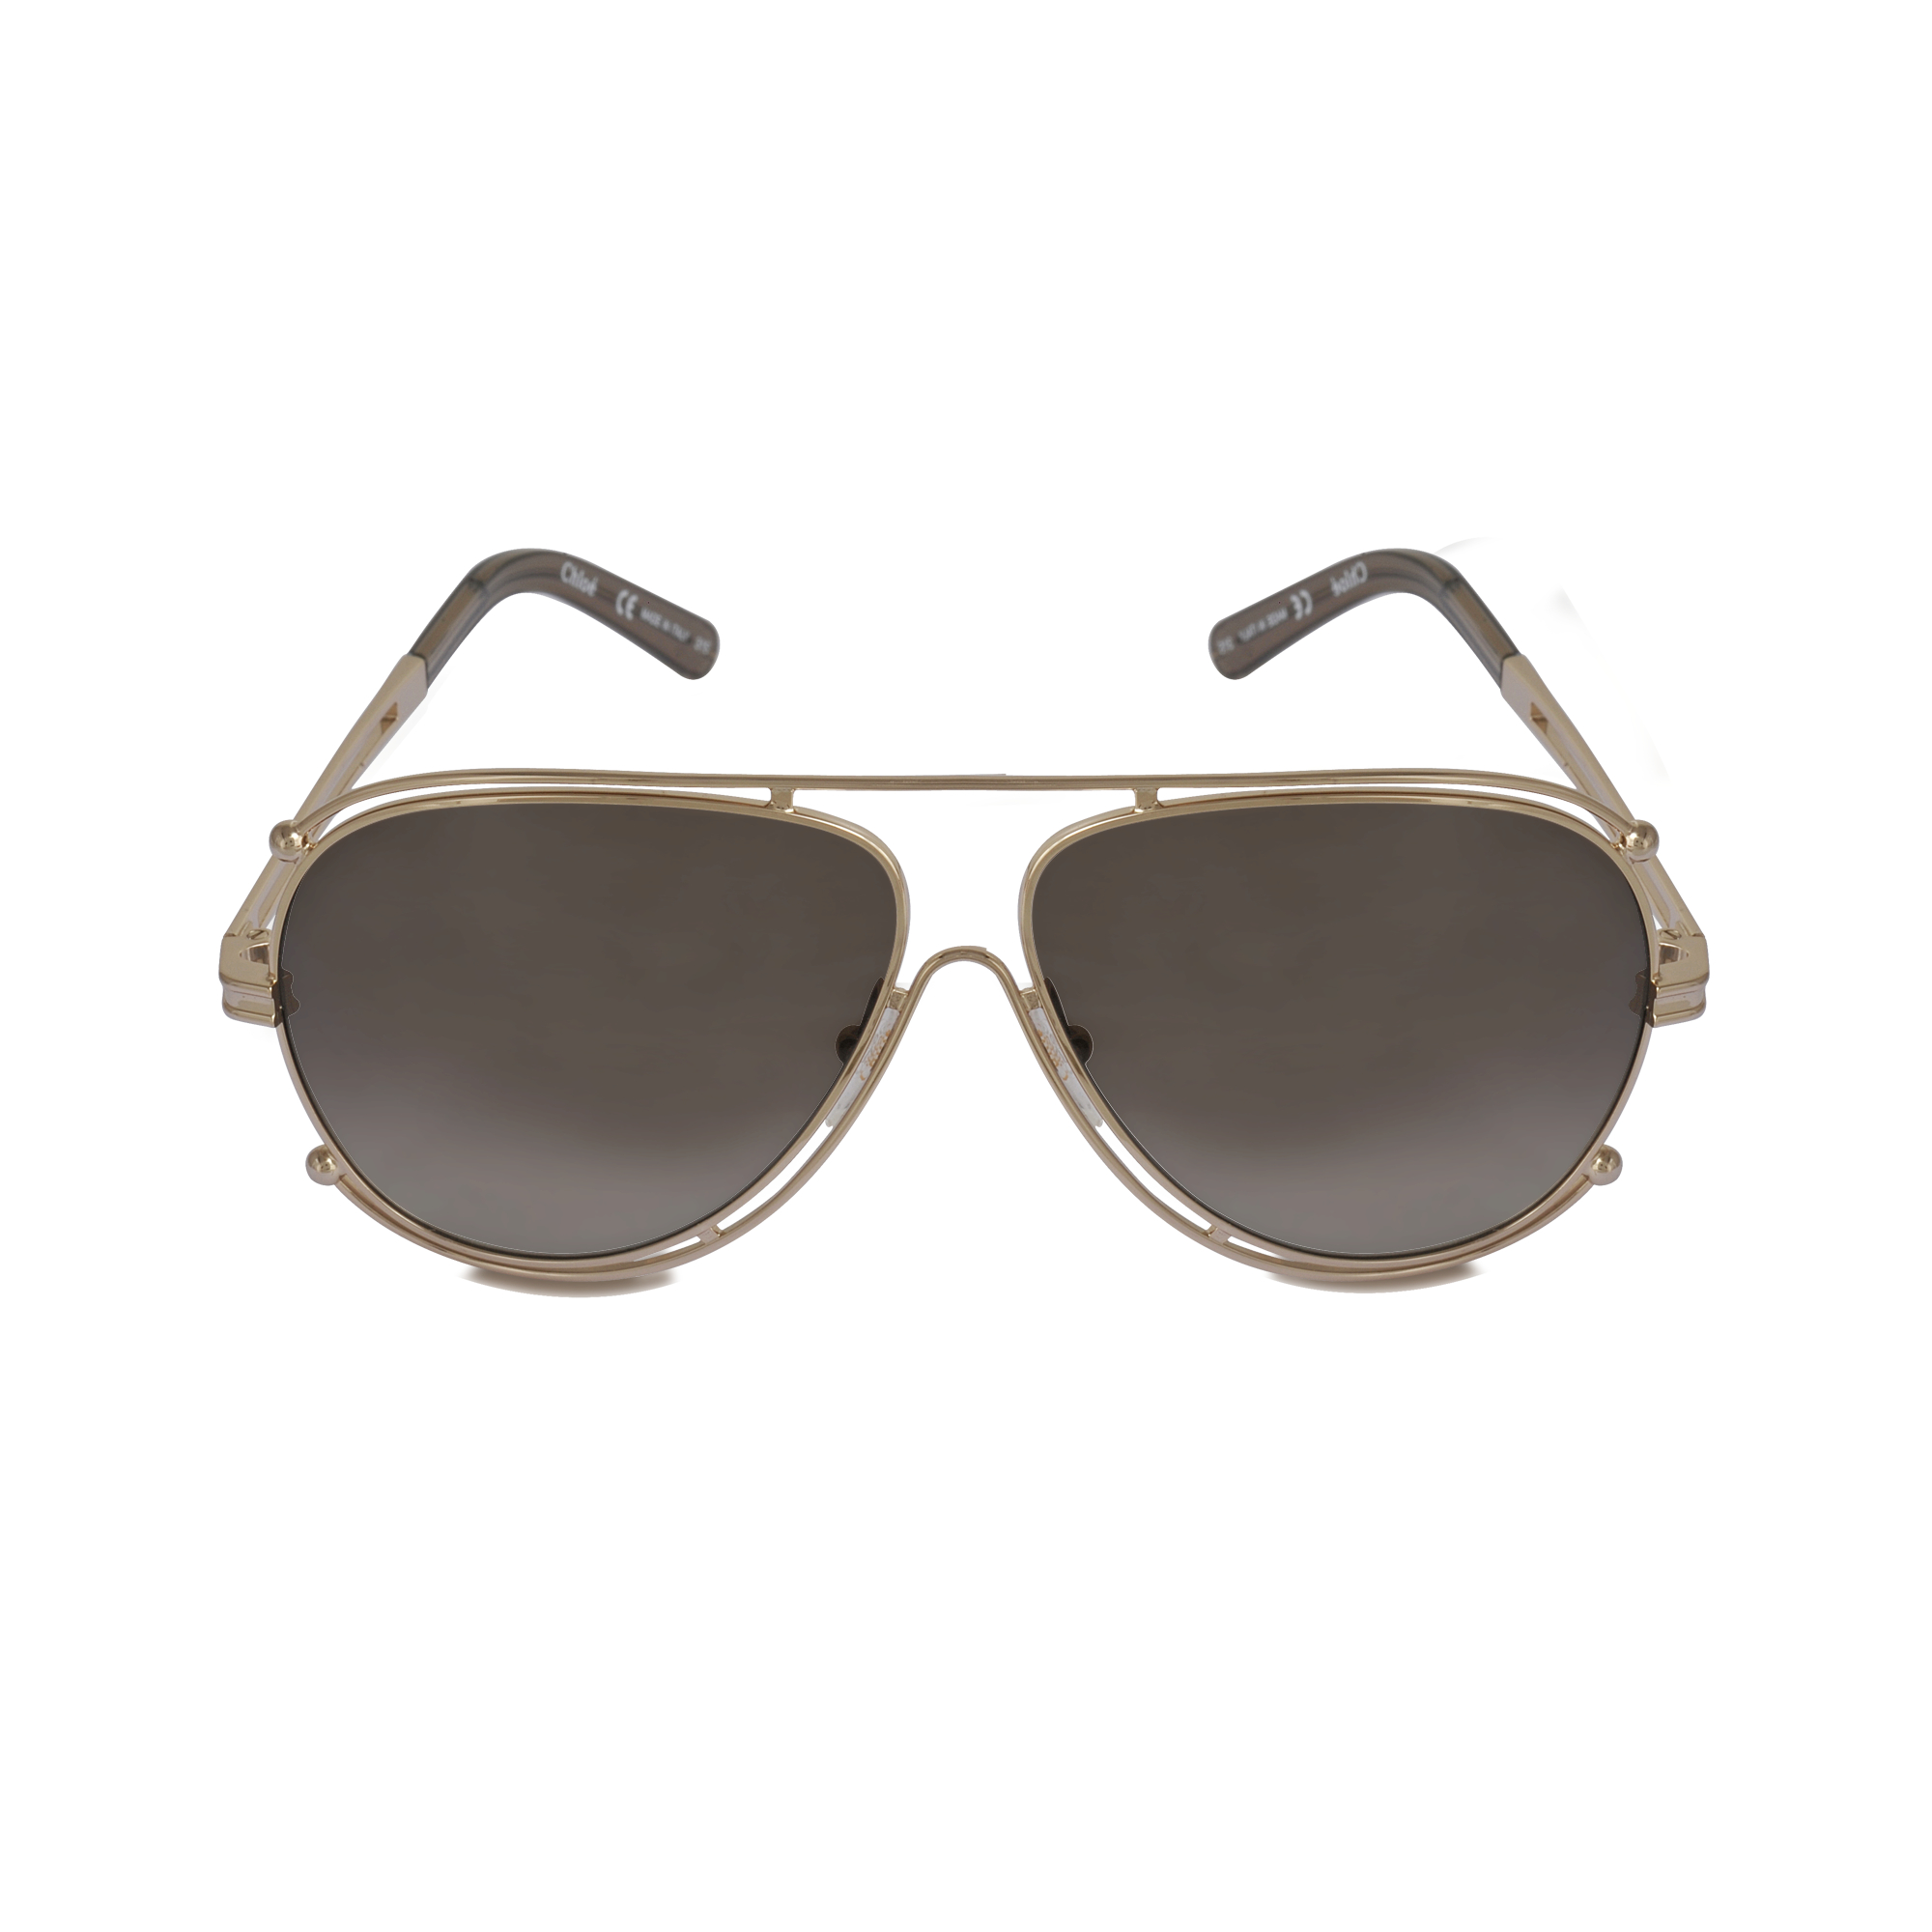 Chloe Gold Frame Sunglasses : Chloe Ce121s Isidora Sunglasses in Gold Lyst